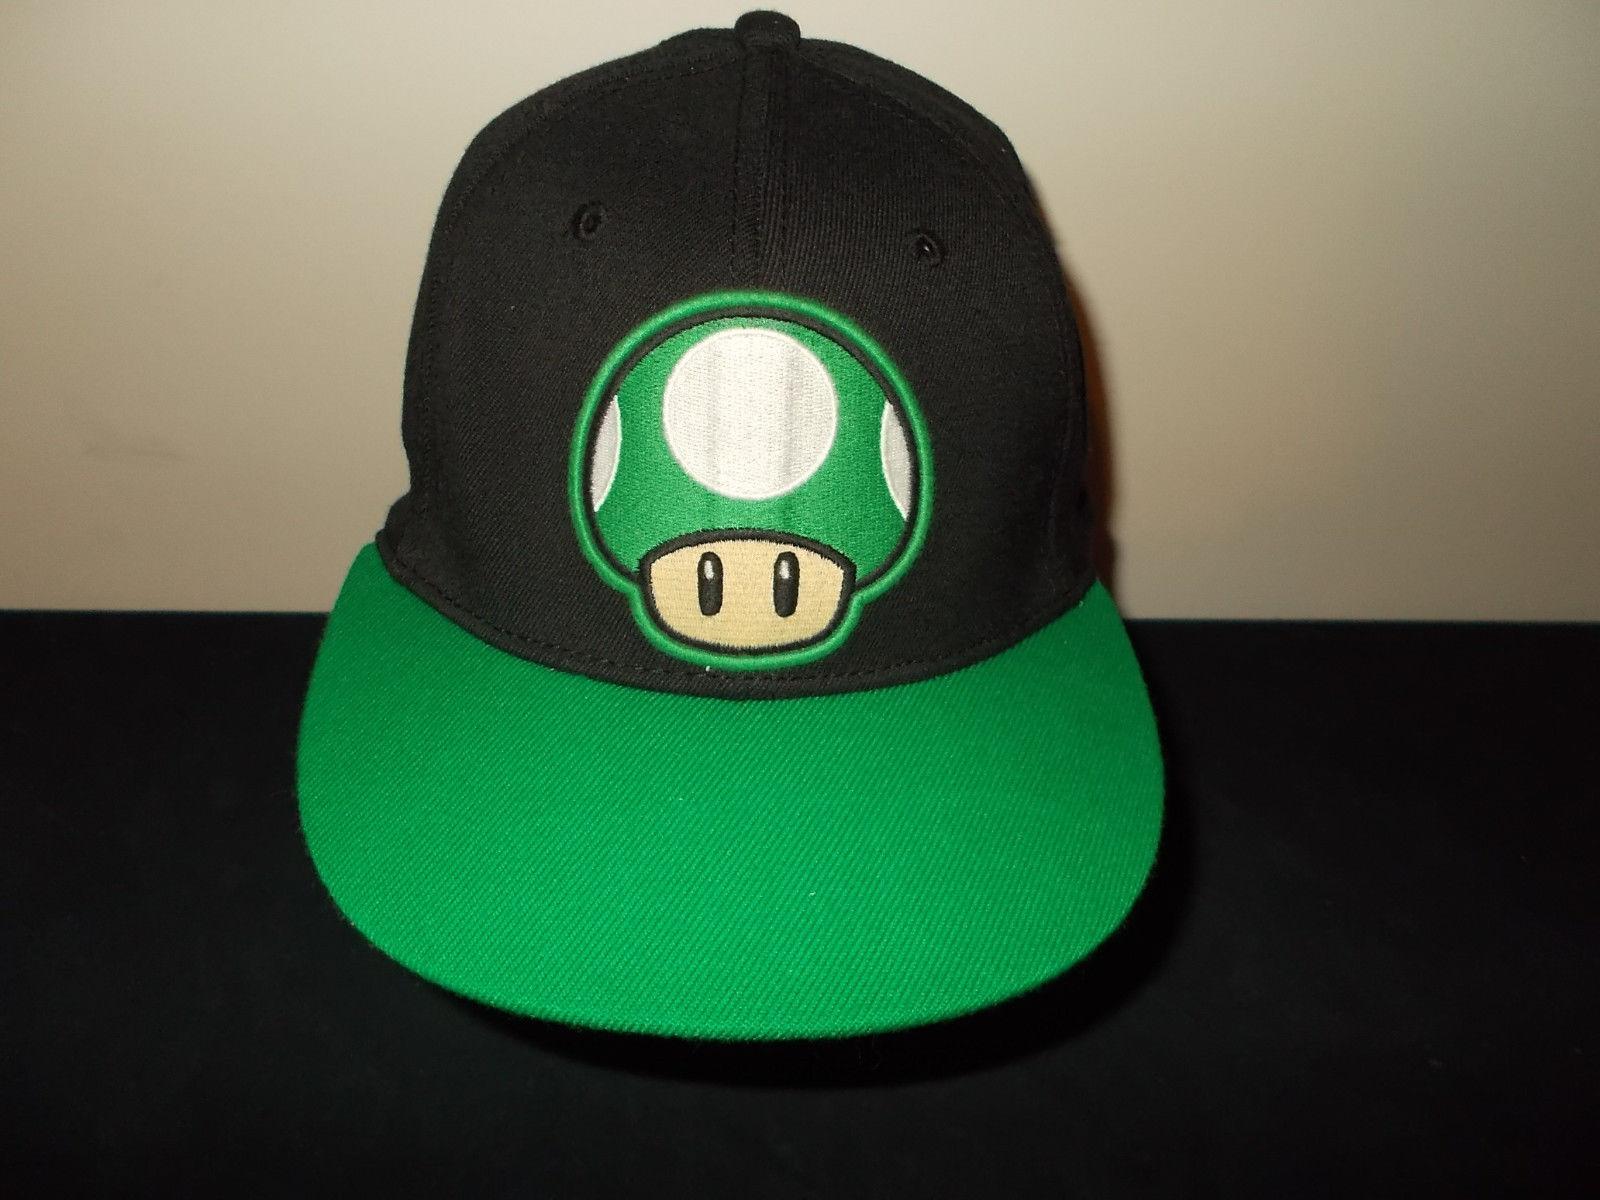 c57821b5d5b Super Mario Brothers Nintendo Mushroom and 50 similar items. S l1600